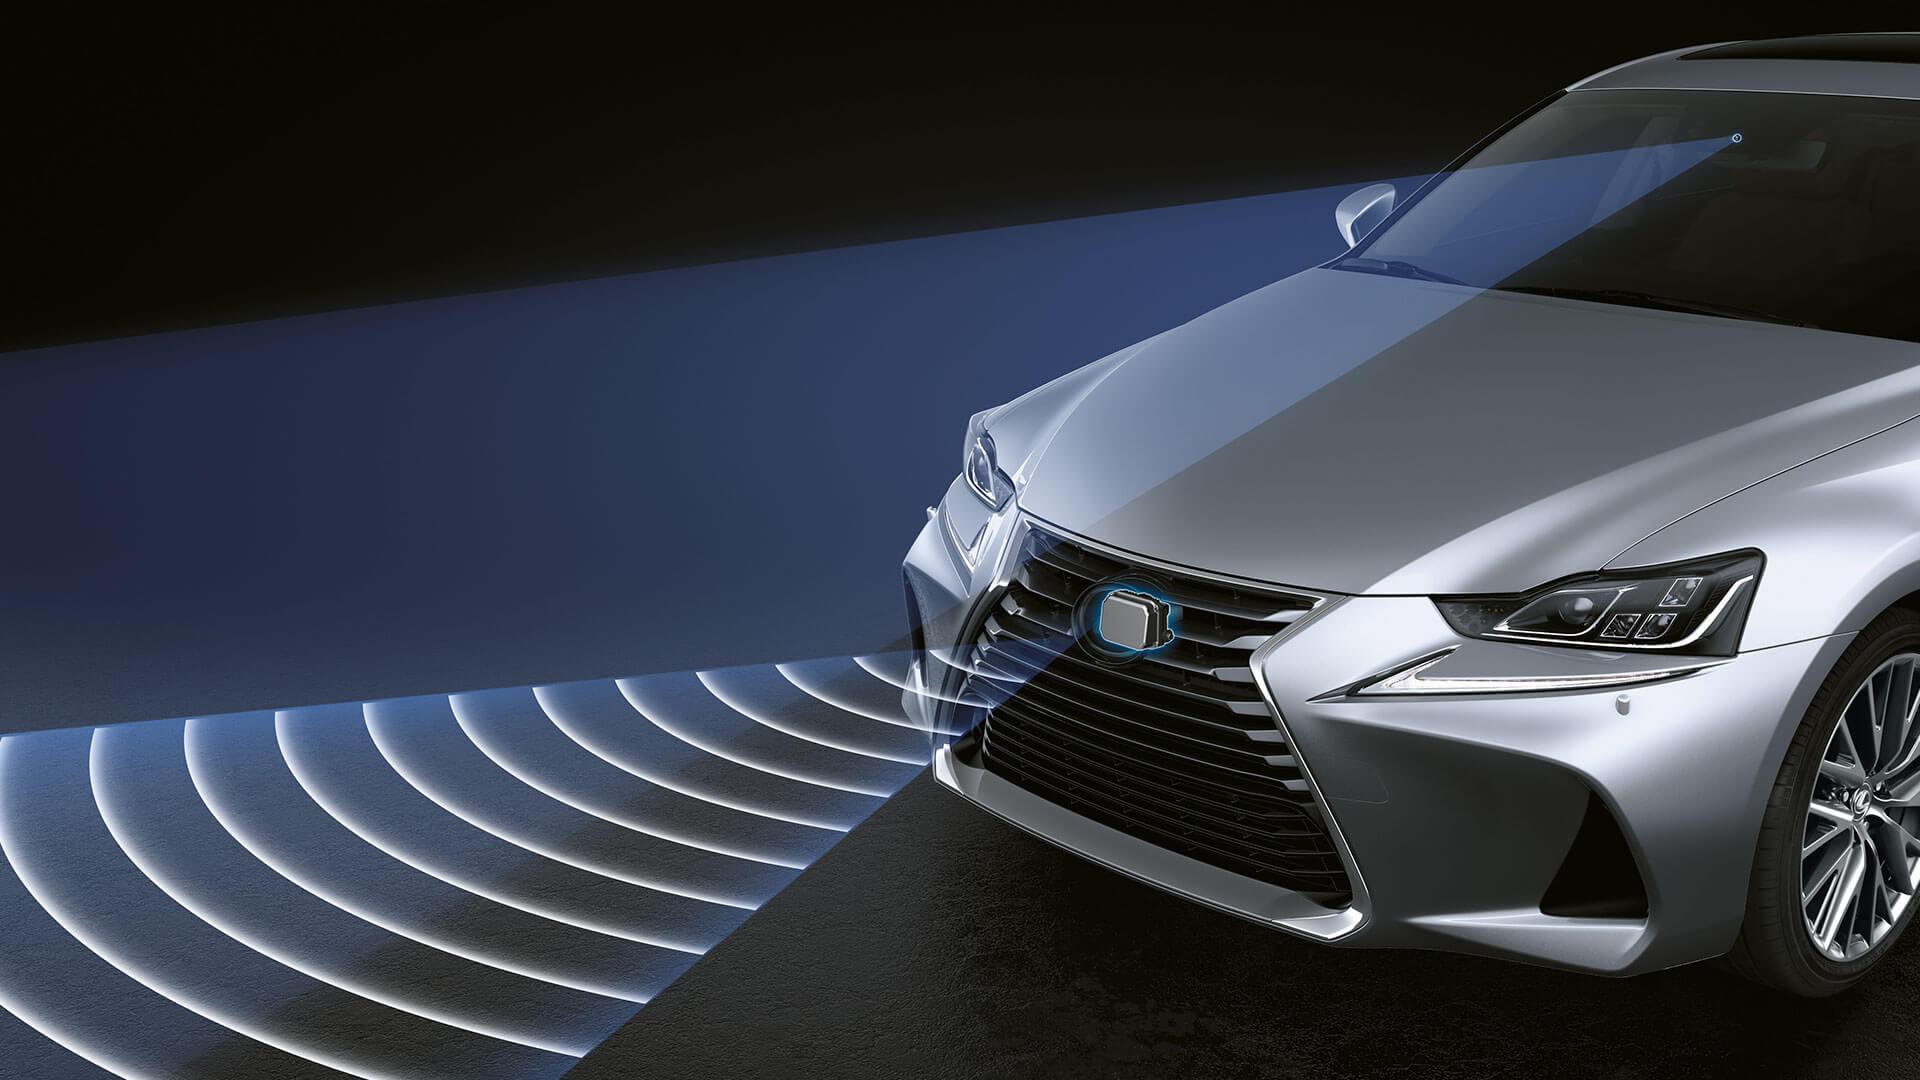 2017 lexus is 300h features pedestrian detection